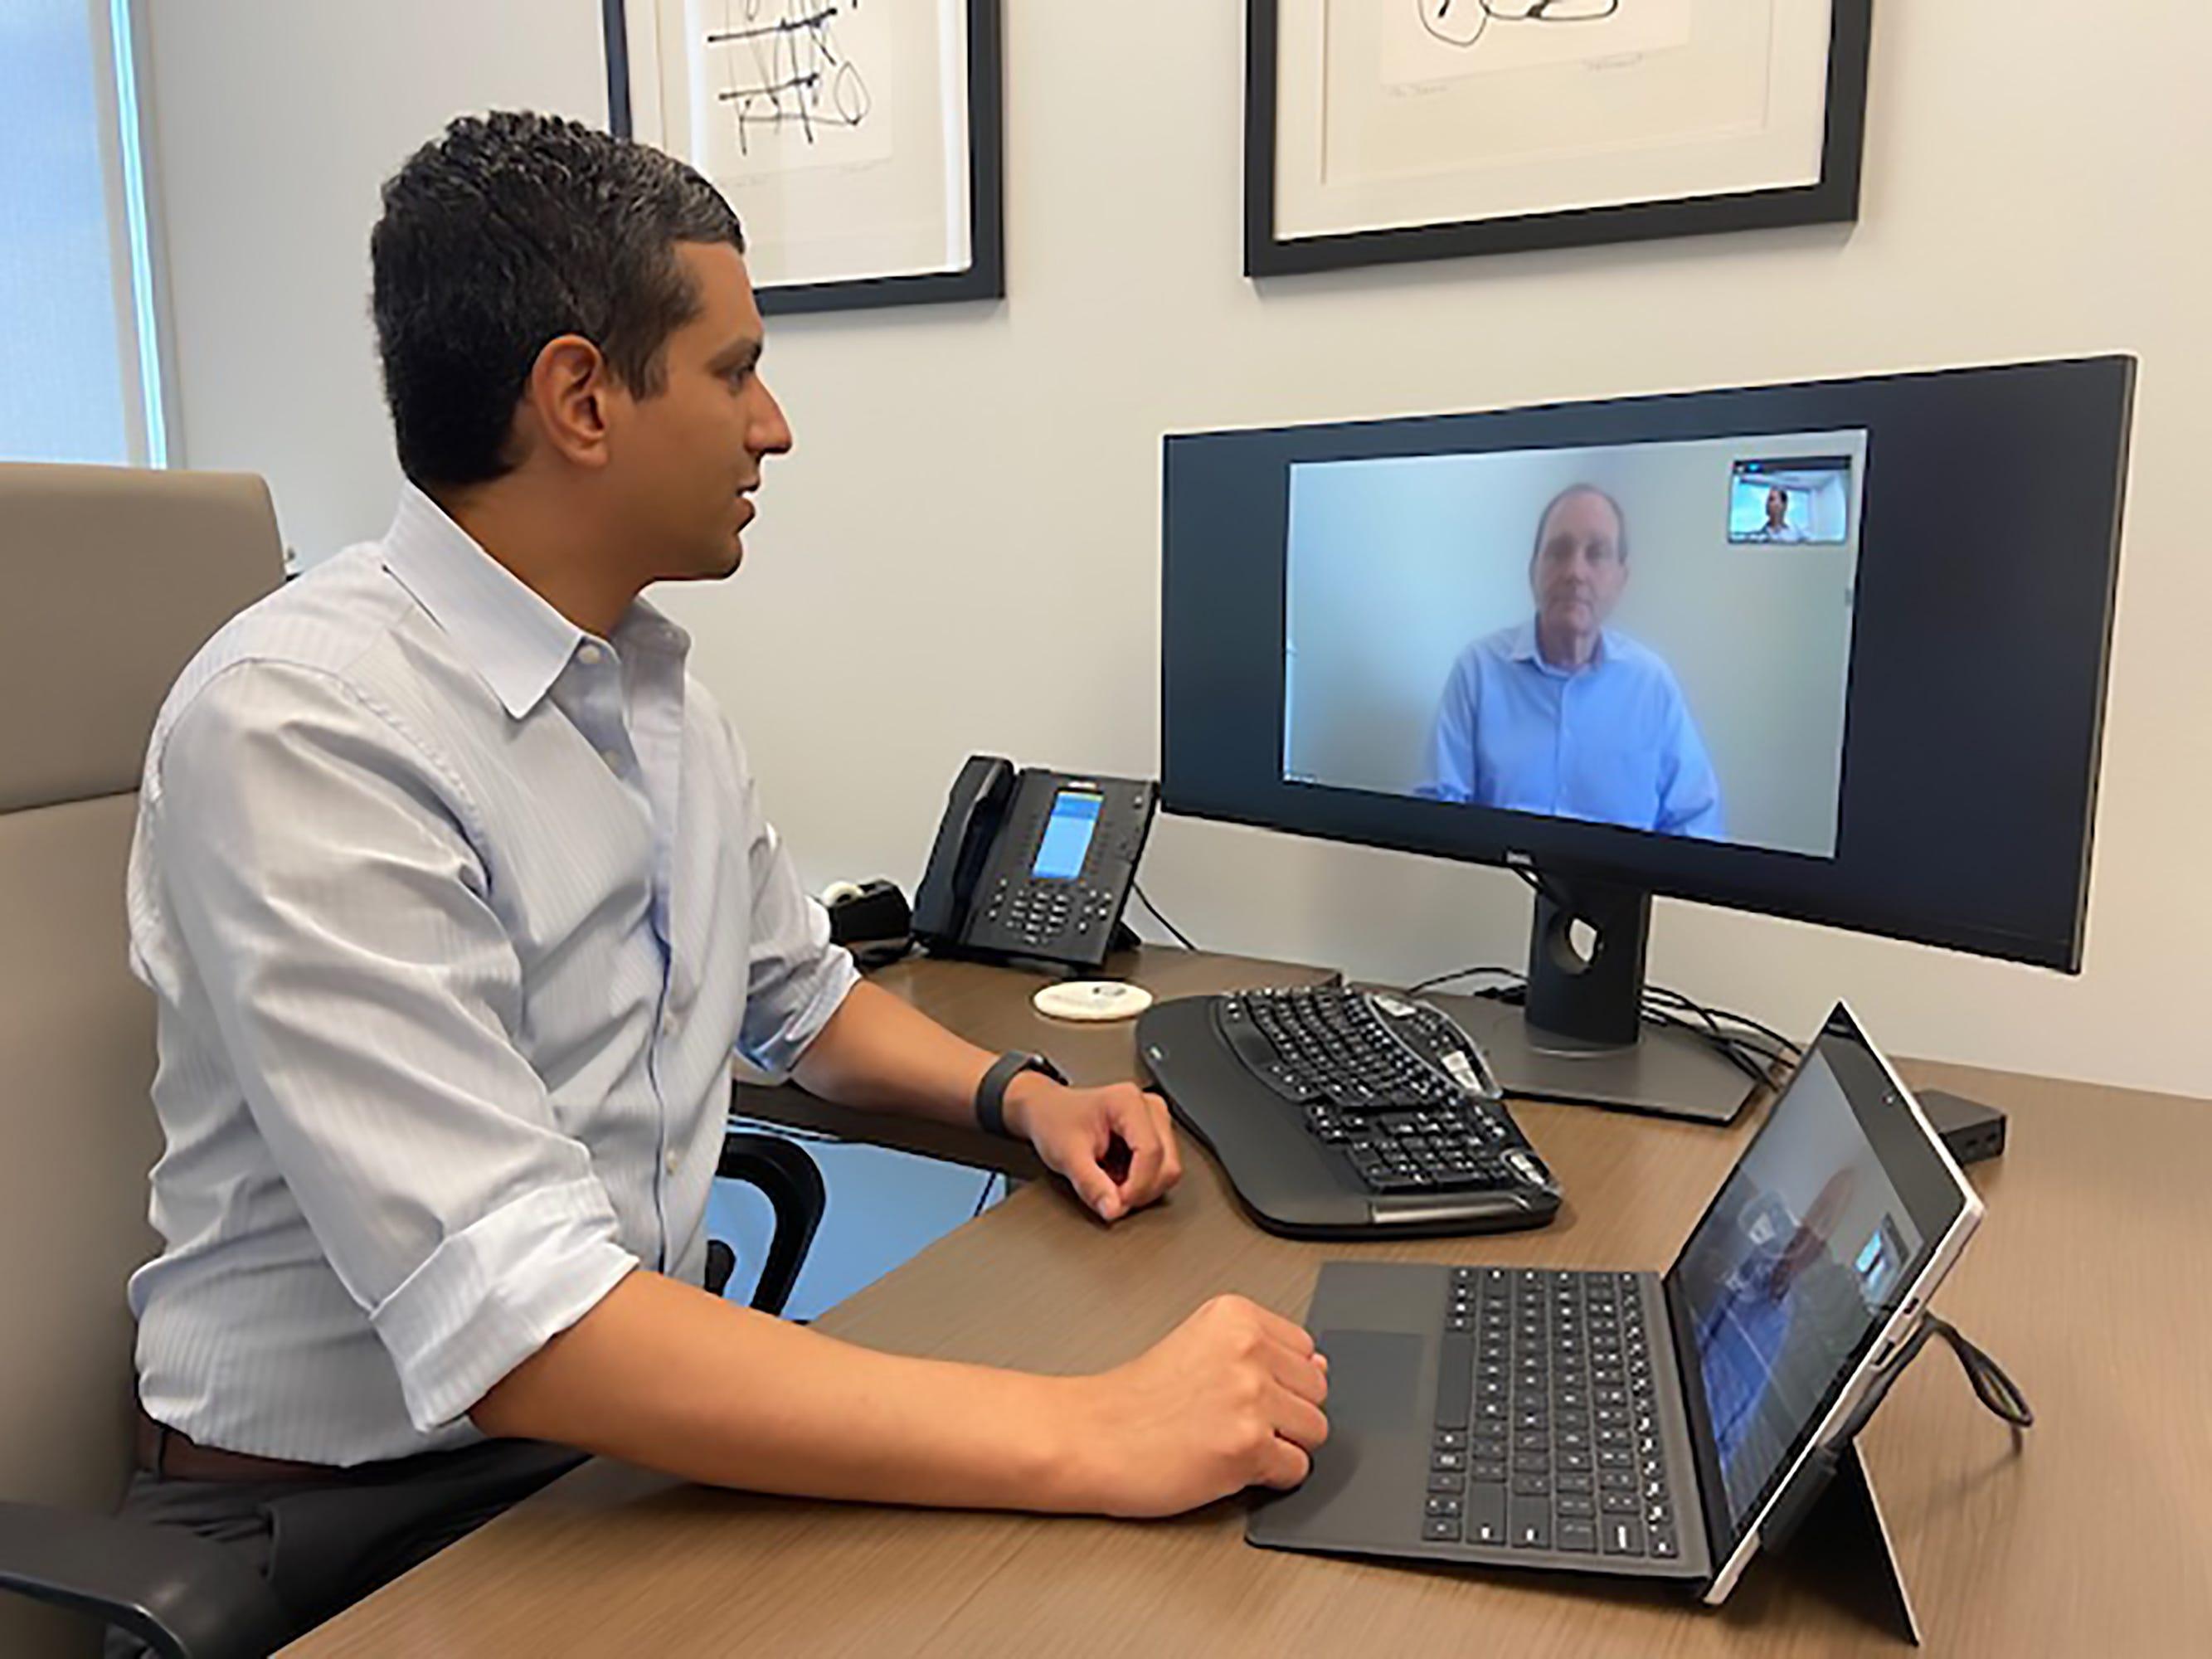 Despite COVID-19 increase, insurance companies to pull back telehealth